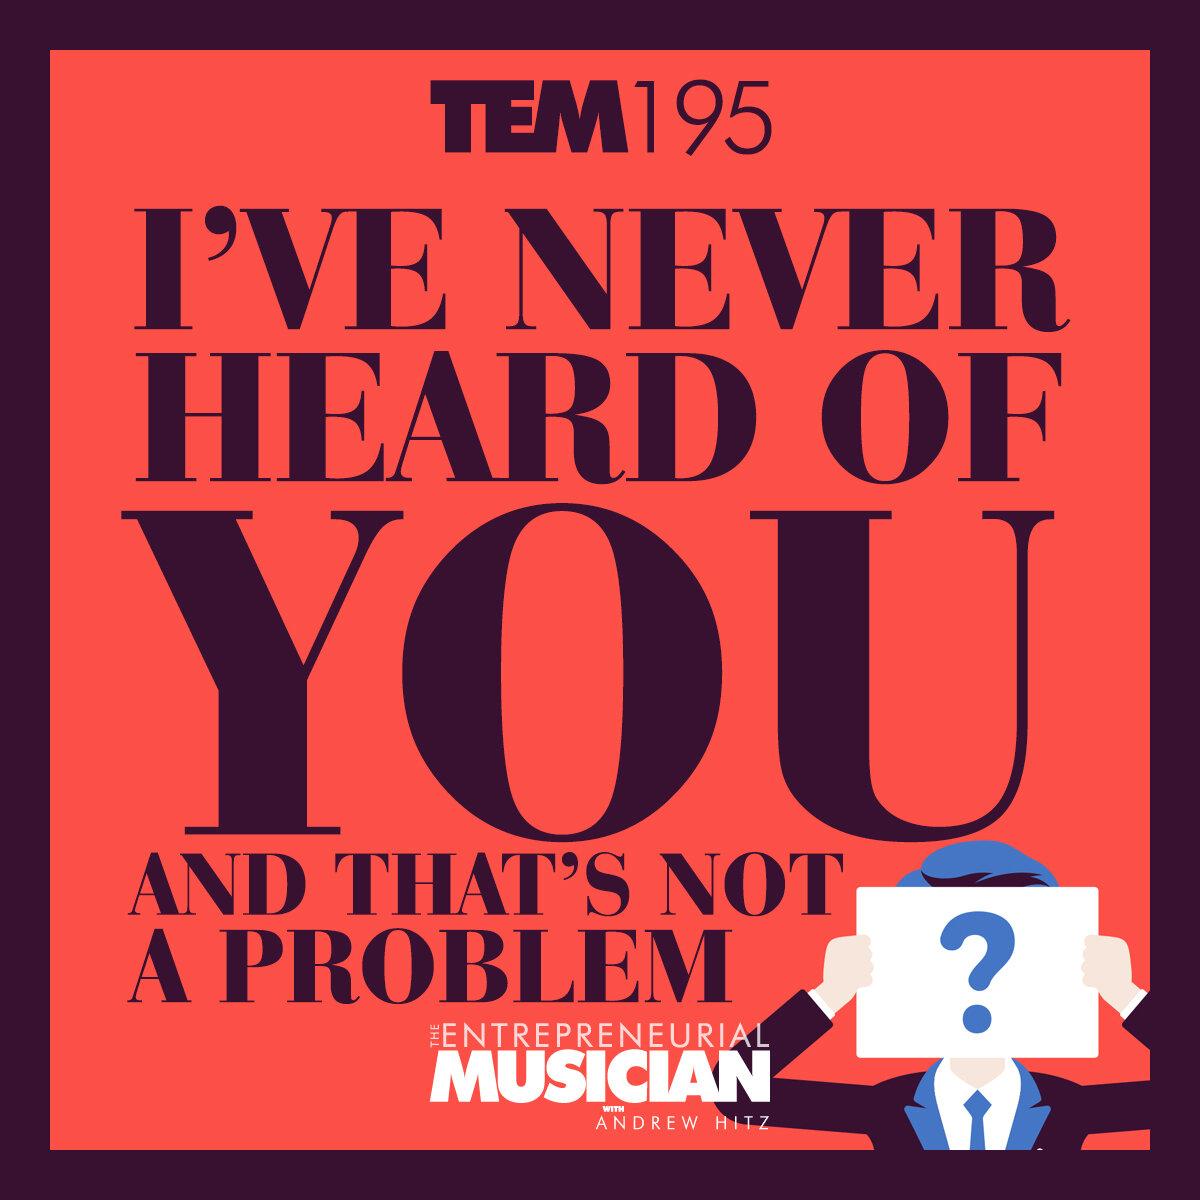 TEM195-Promo.jpg